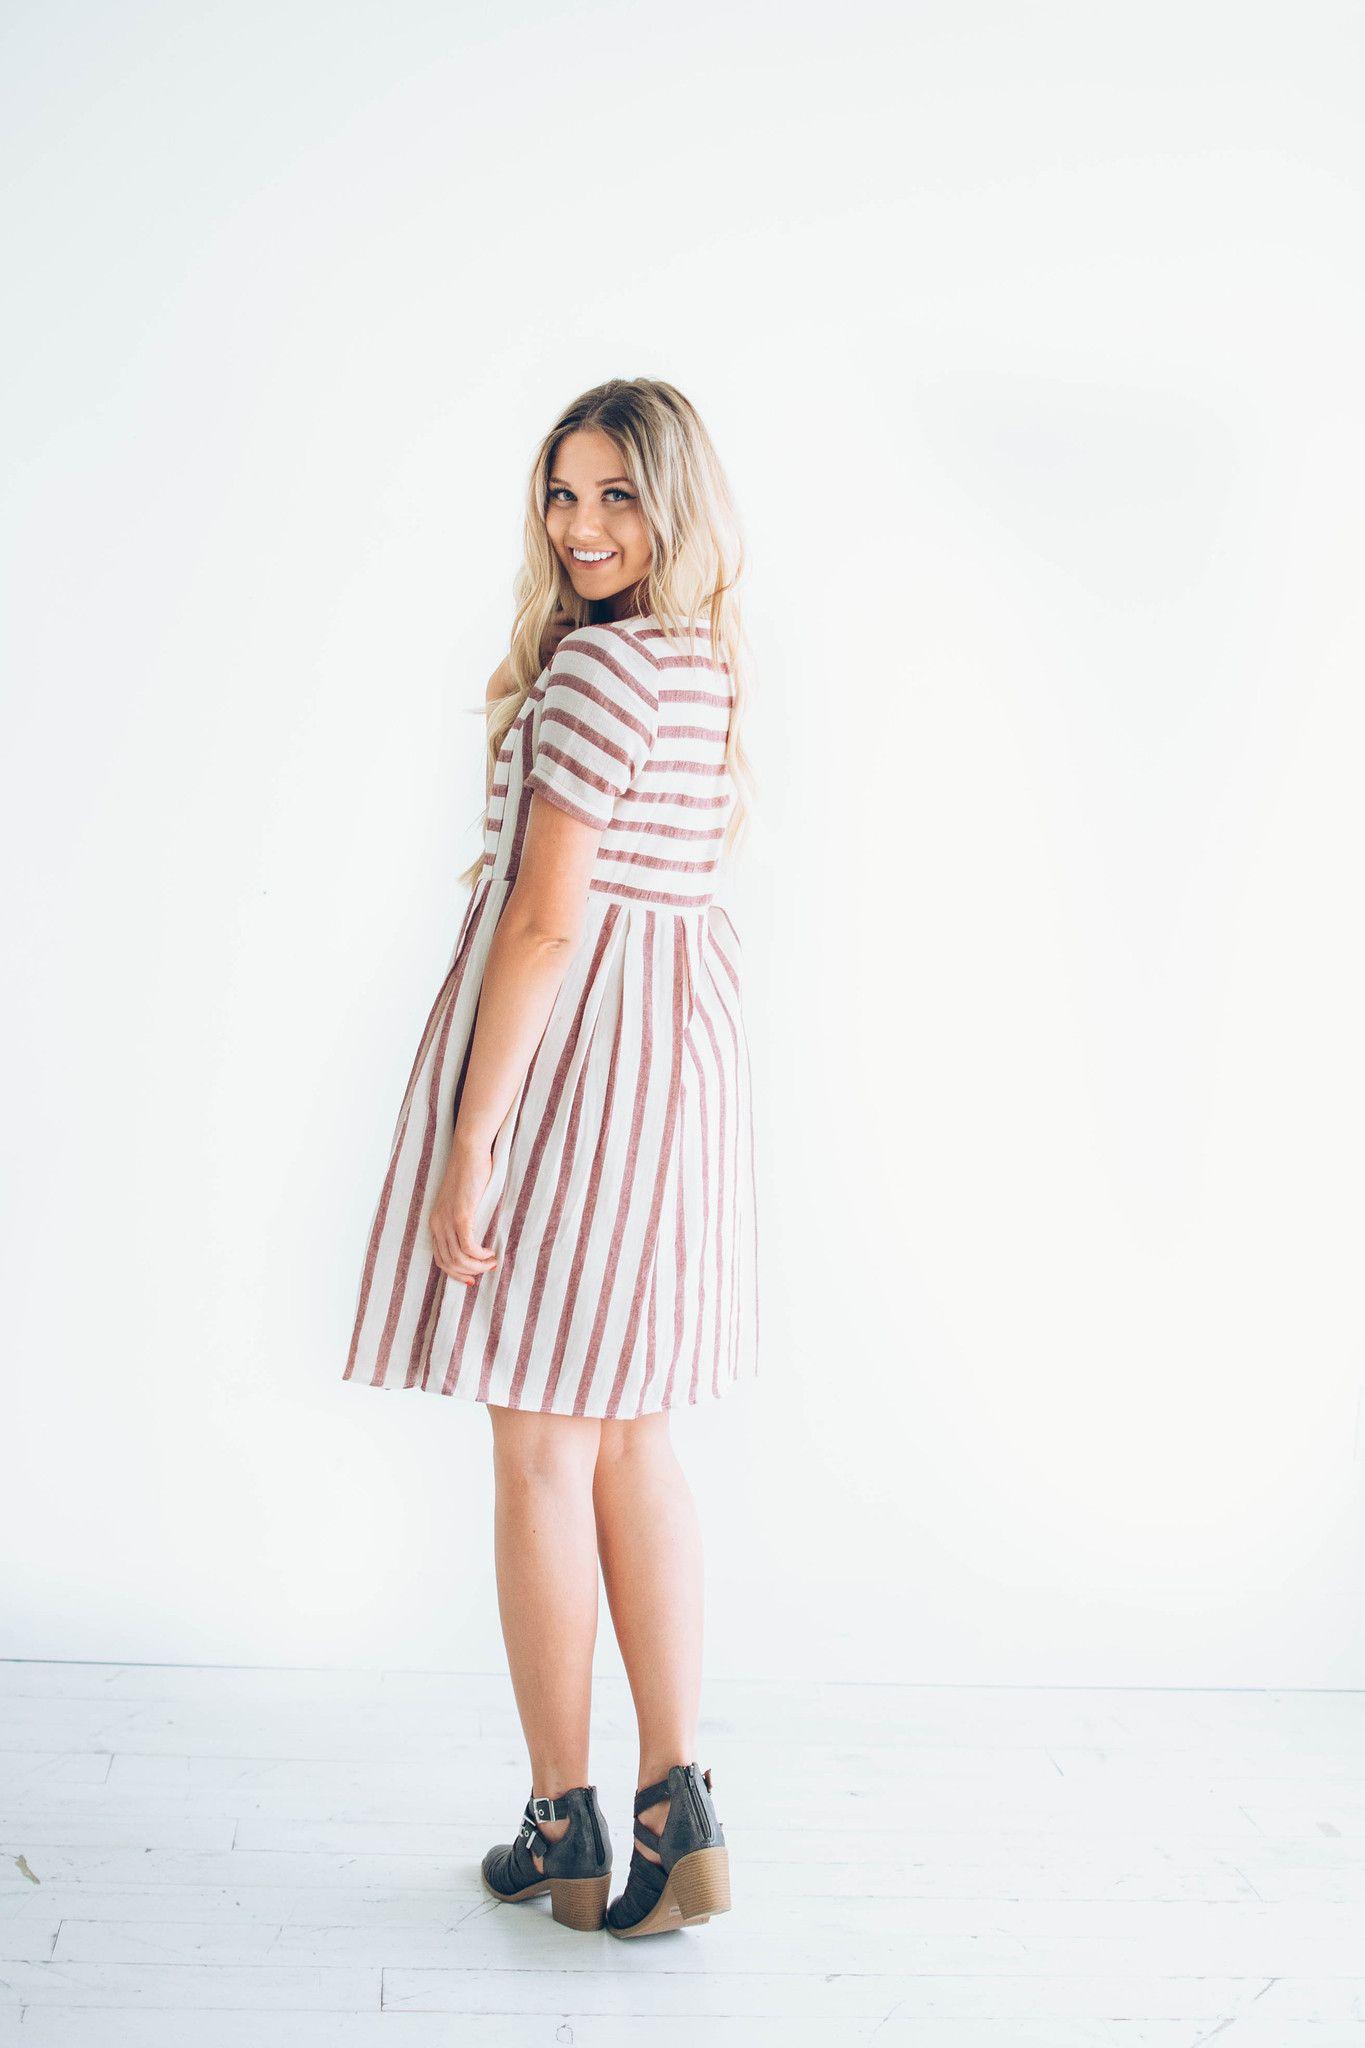 Kensington Dress – Recks&Relle